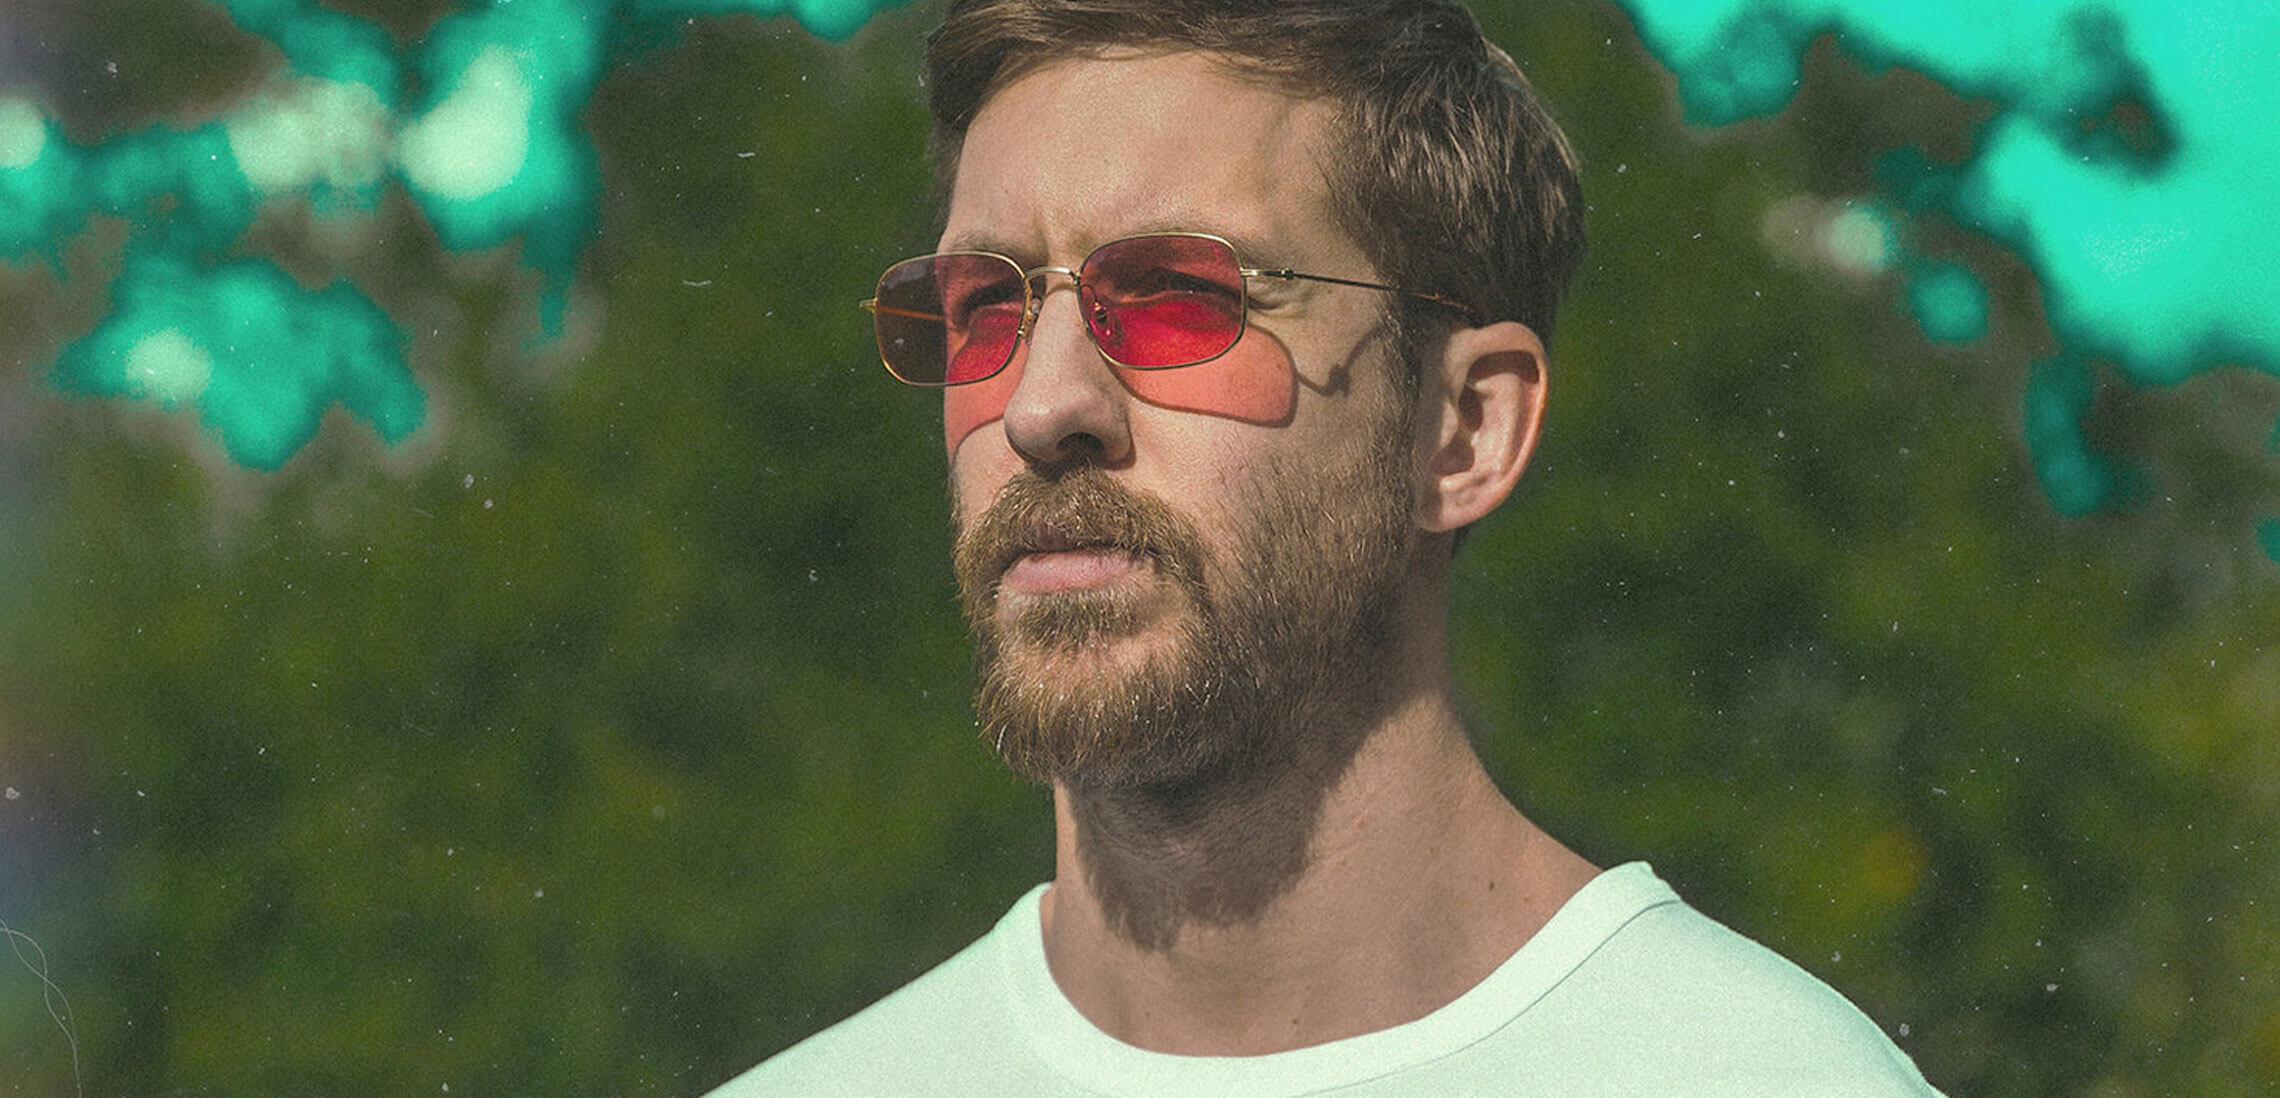 Love Regenerator aka Calvin Harris headlines Defected Virtual Festival 3.0